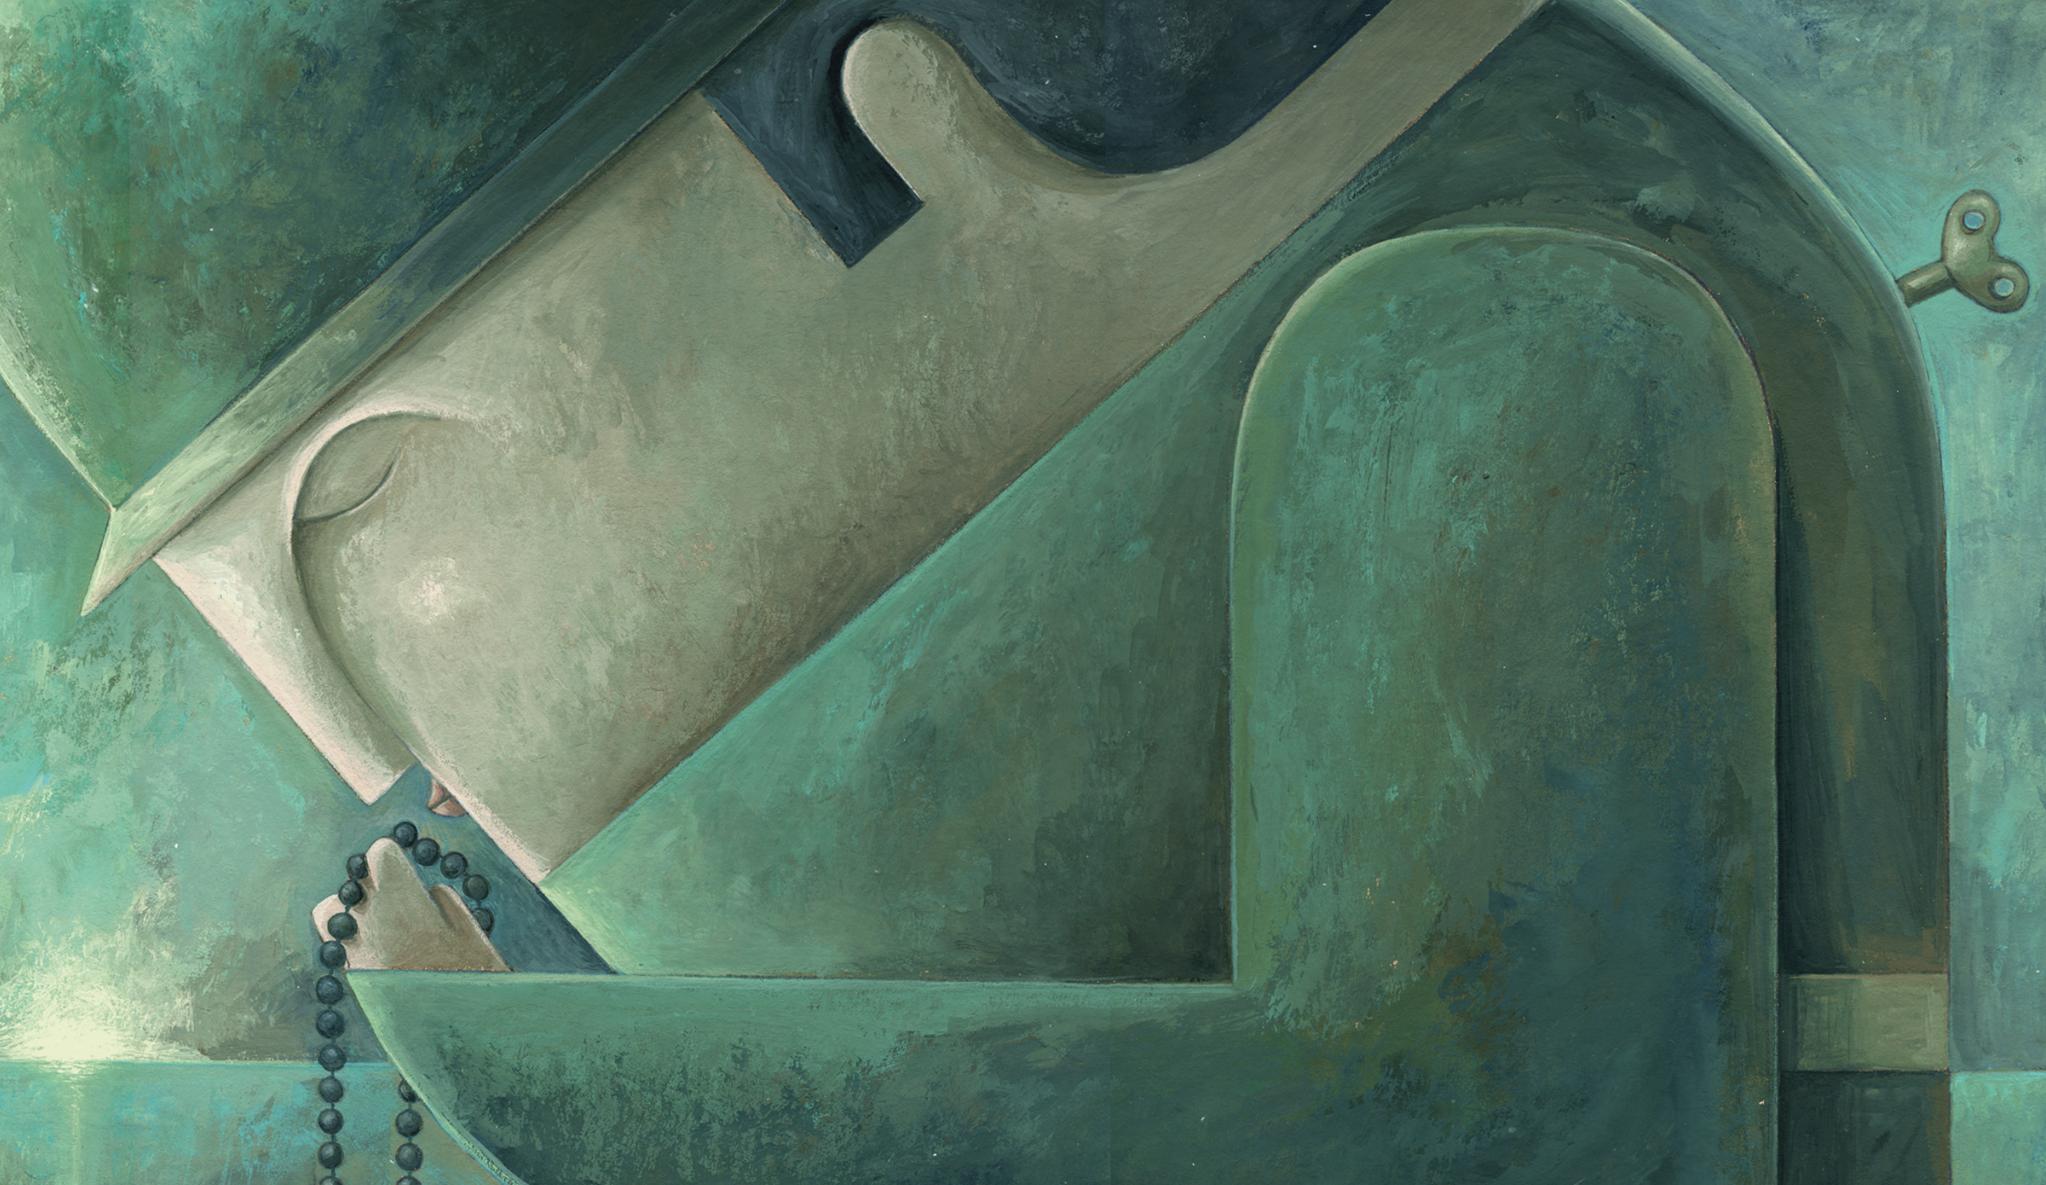 #handmade #guache #book #childrenbook #edition #littlesoldier #illustration #publishinghause #editorial